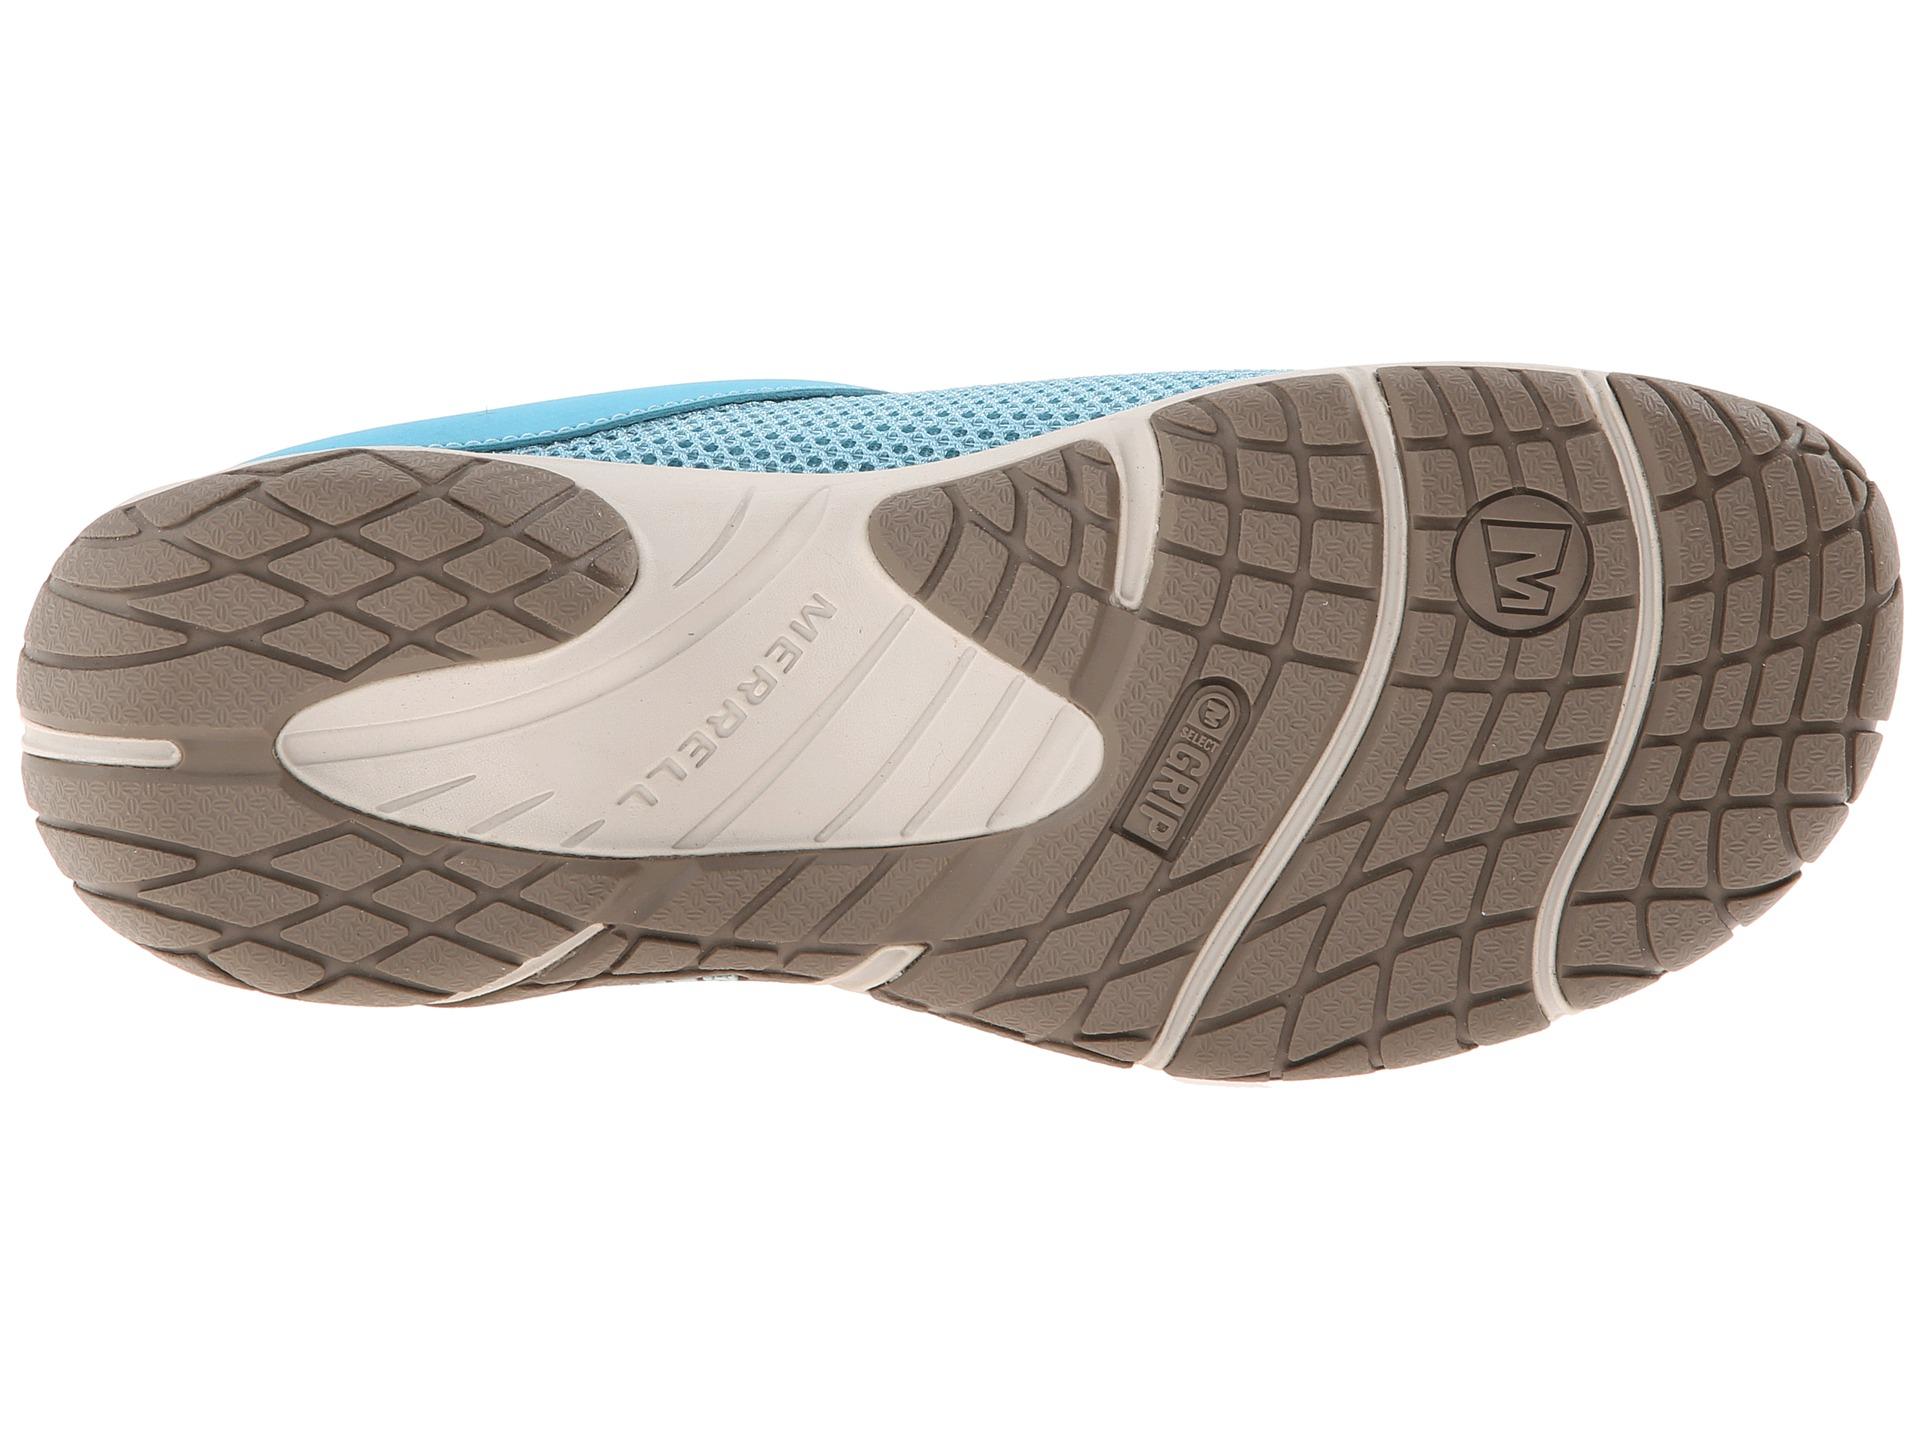 Merrell Men S Encore Breeze Mesh Slip On Shoes